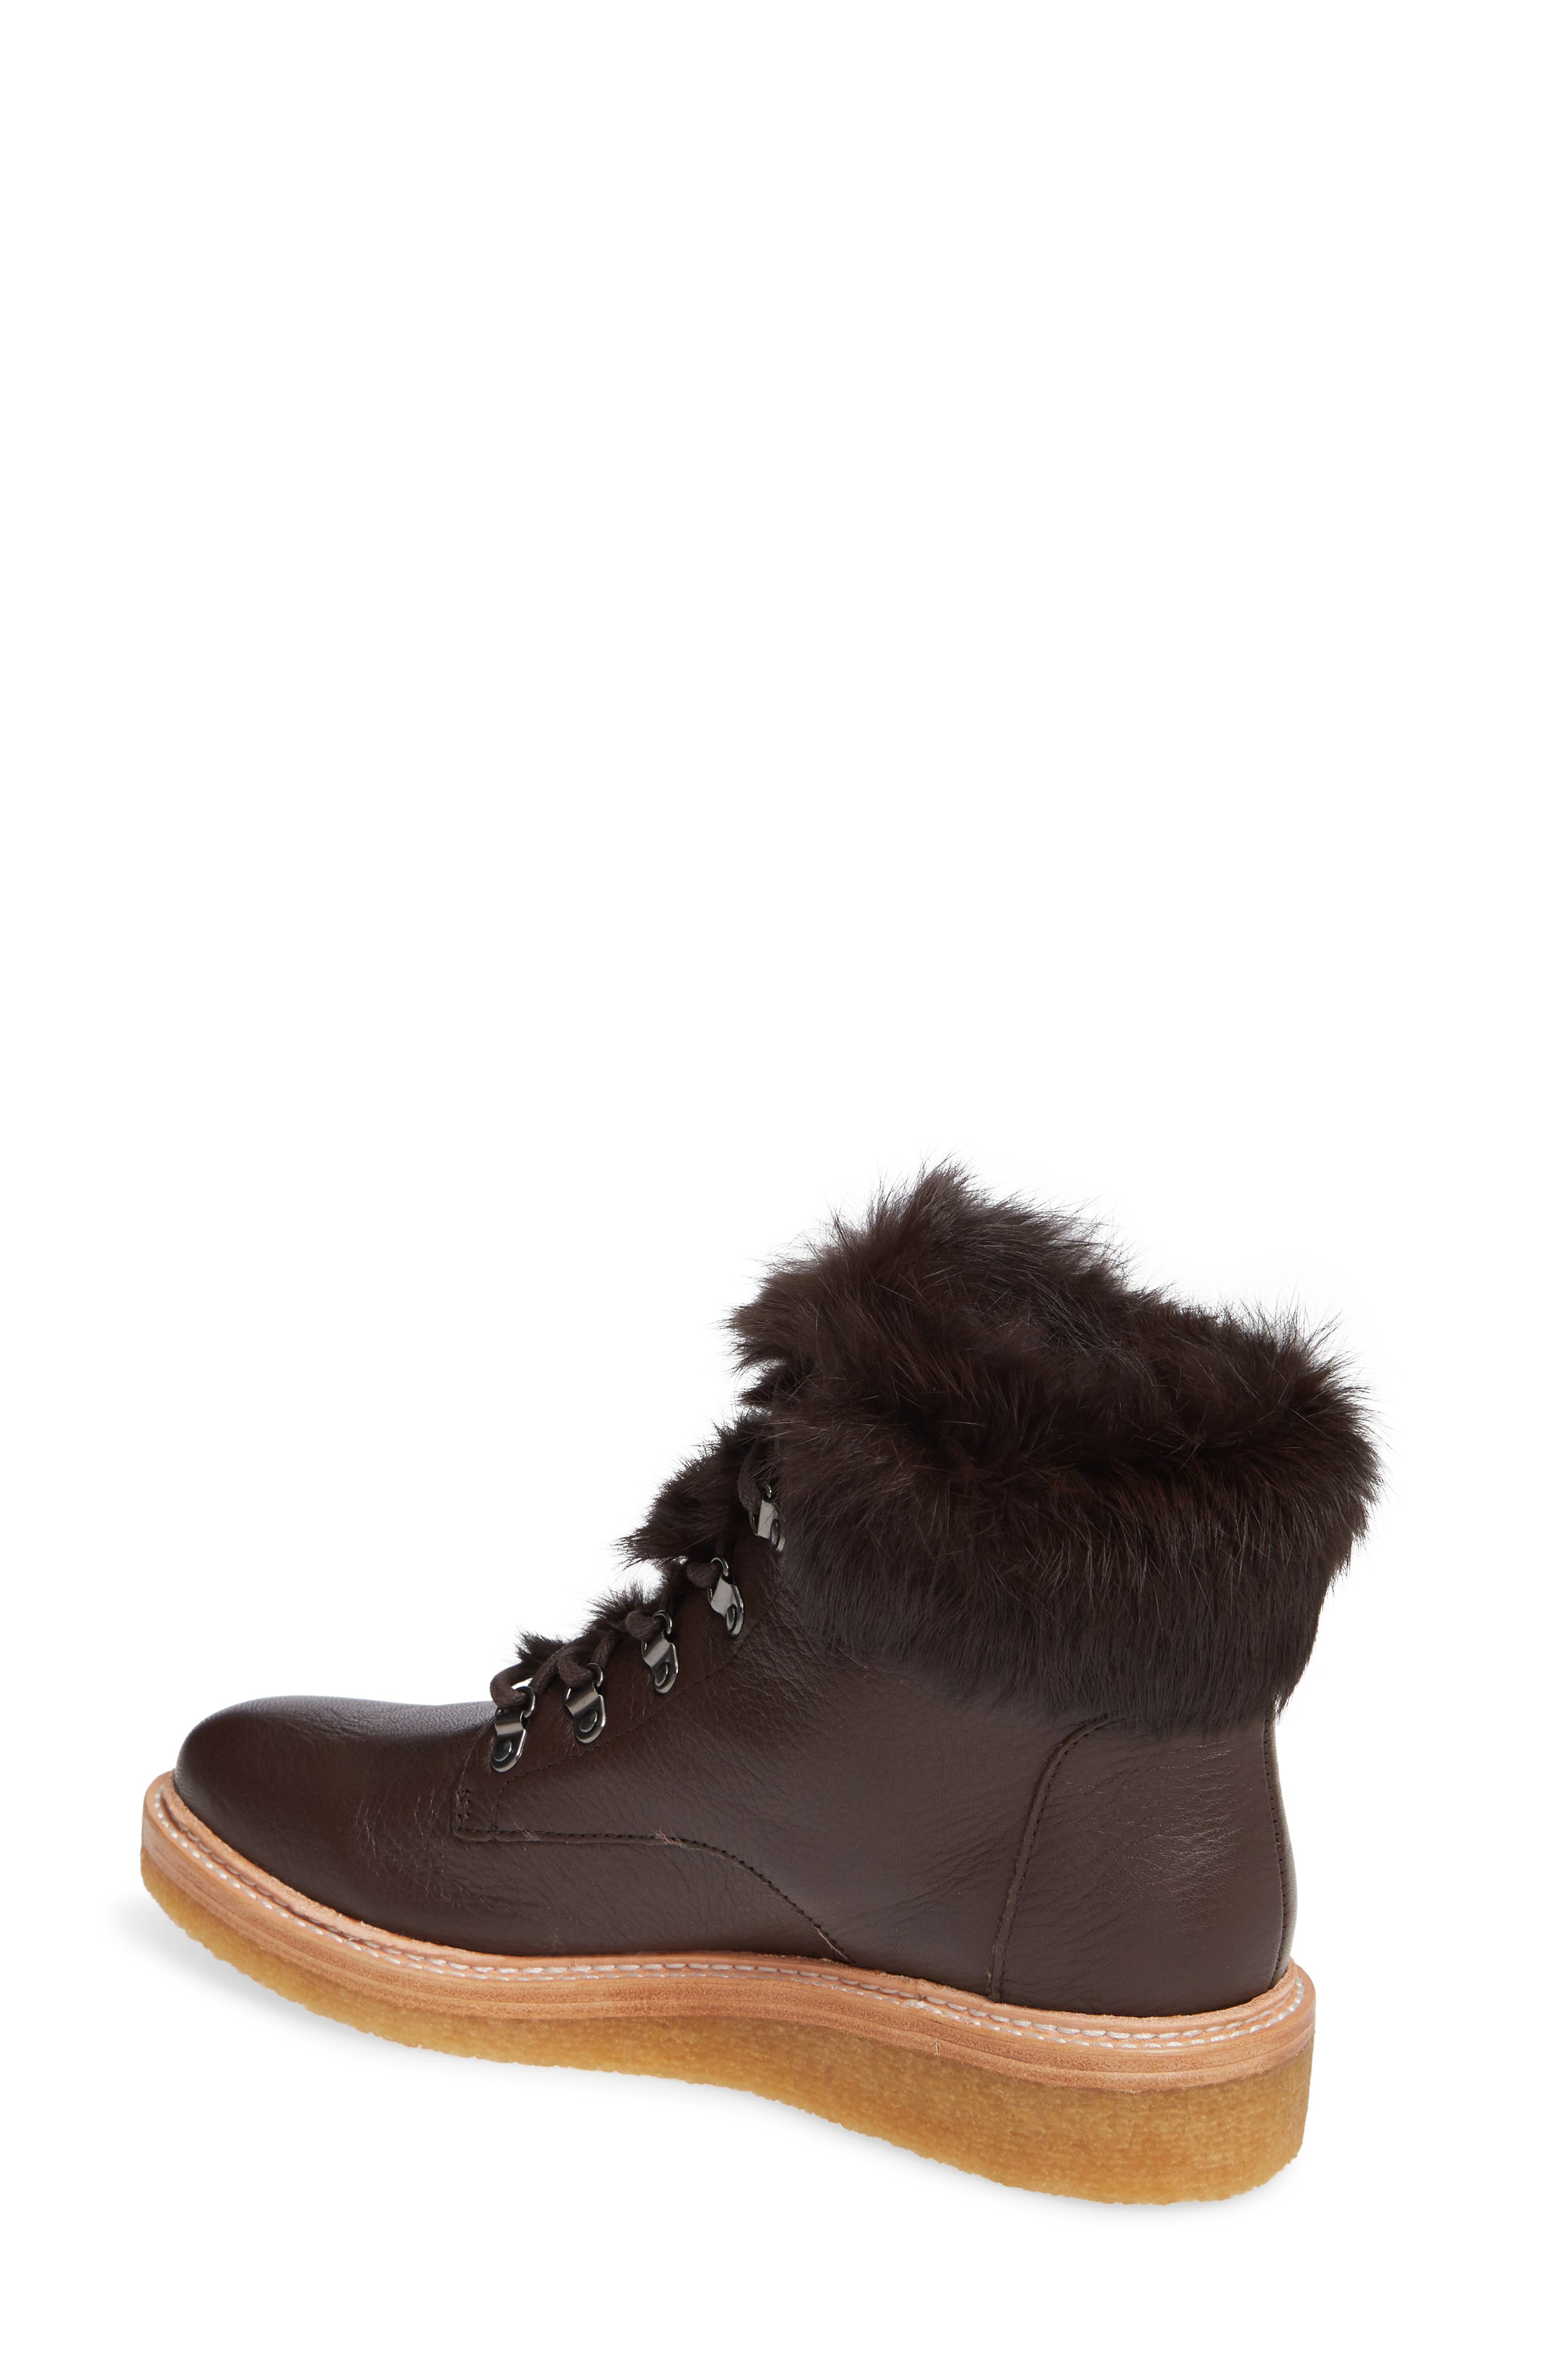 Winter Genuine Rabbit Fur Trim Boot,                             Alternate thumbnail 2, color,                             MOCHA LEATHER